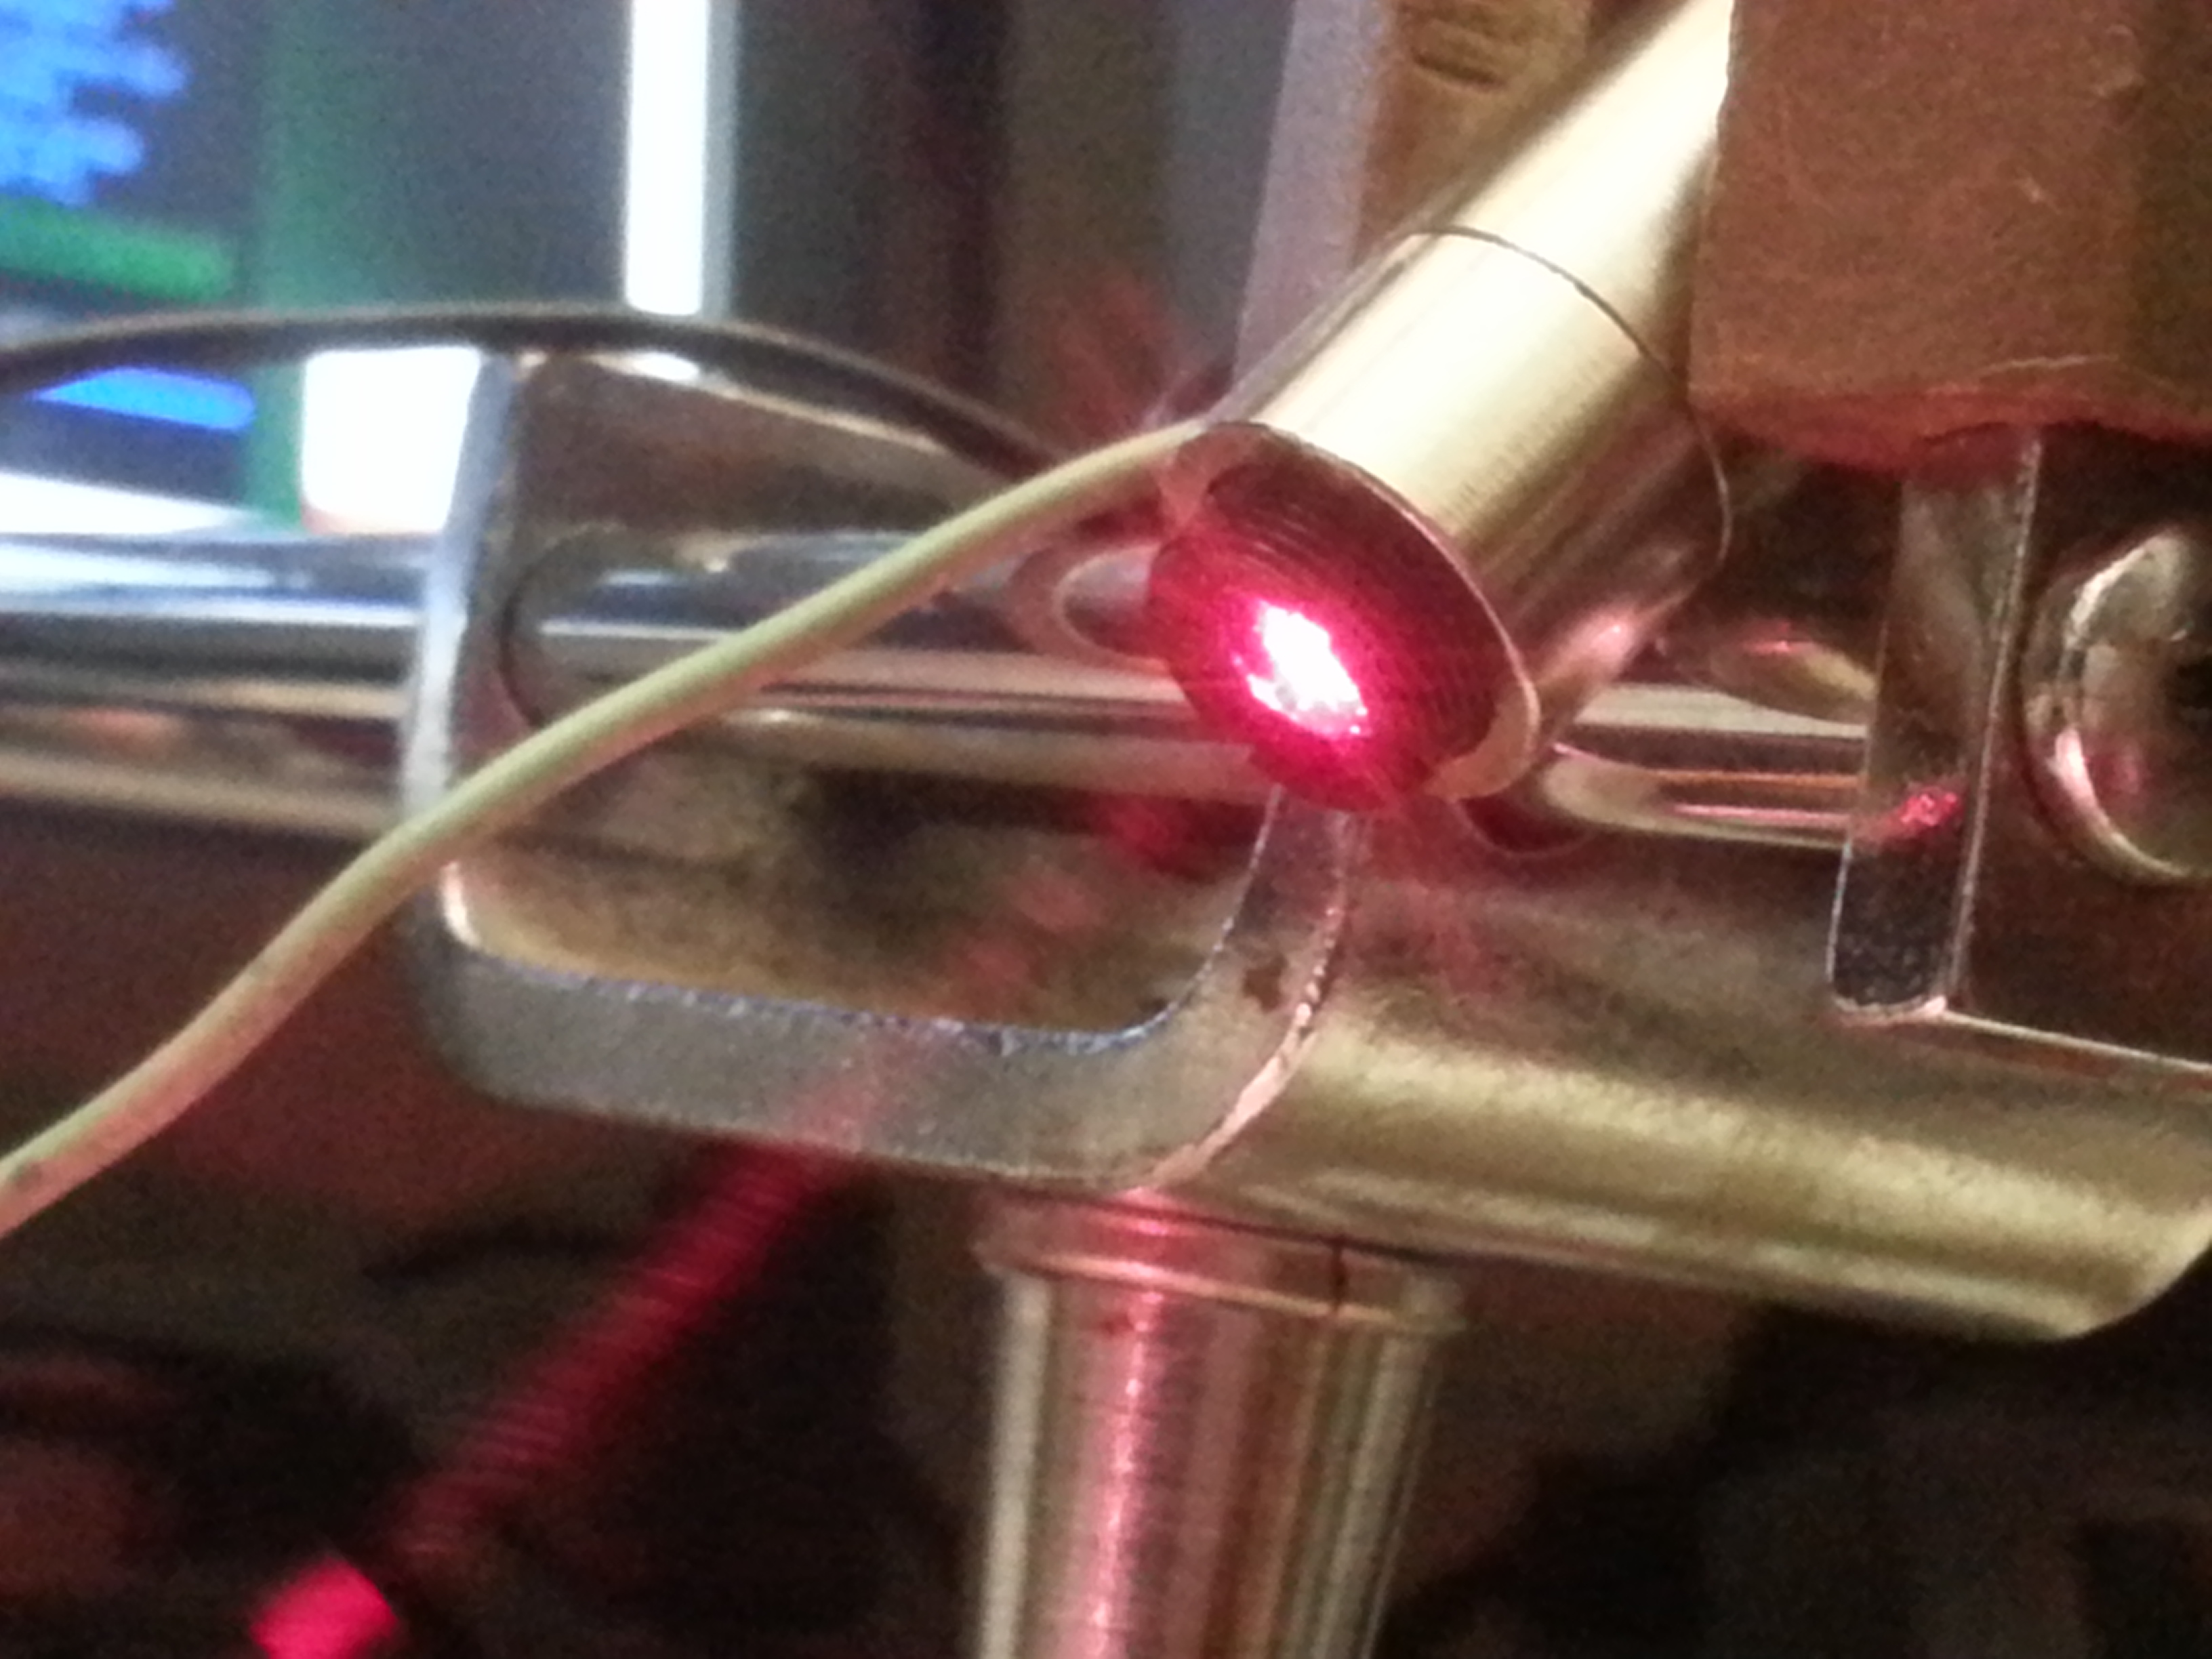 Easy Build Burning Laser For Less Than $20